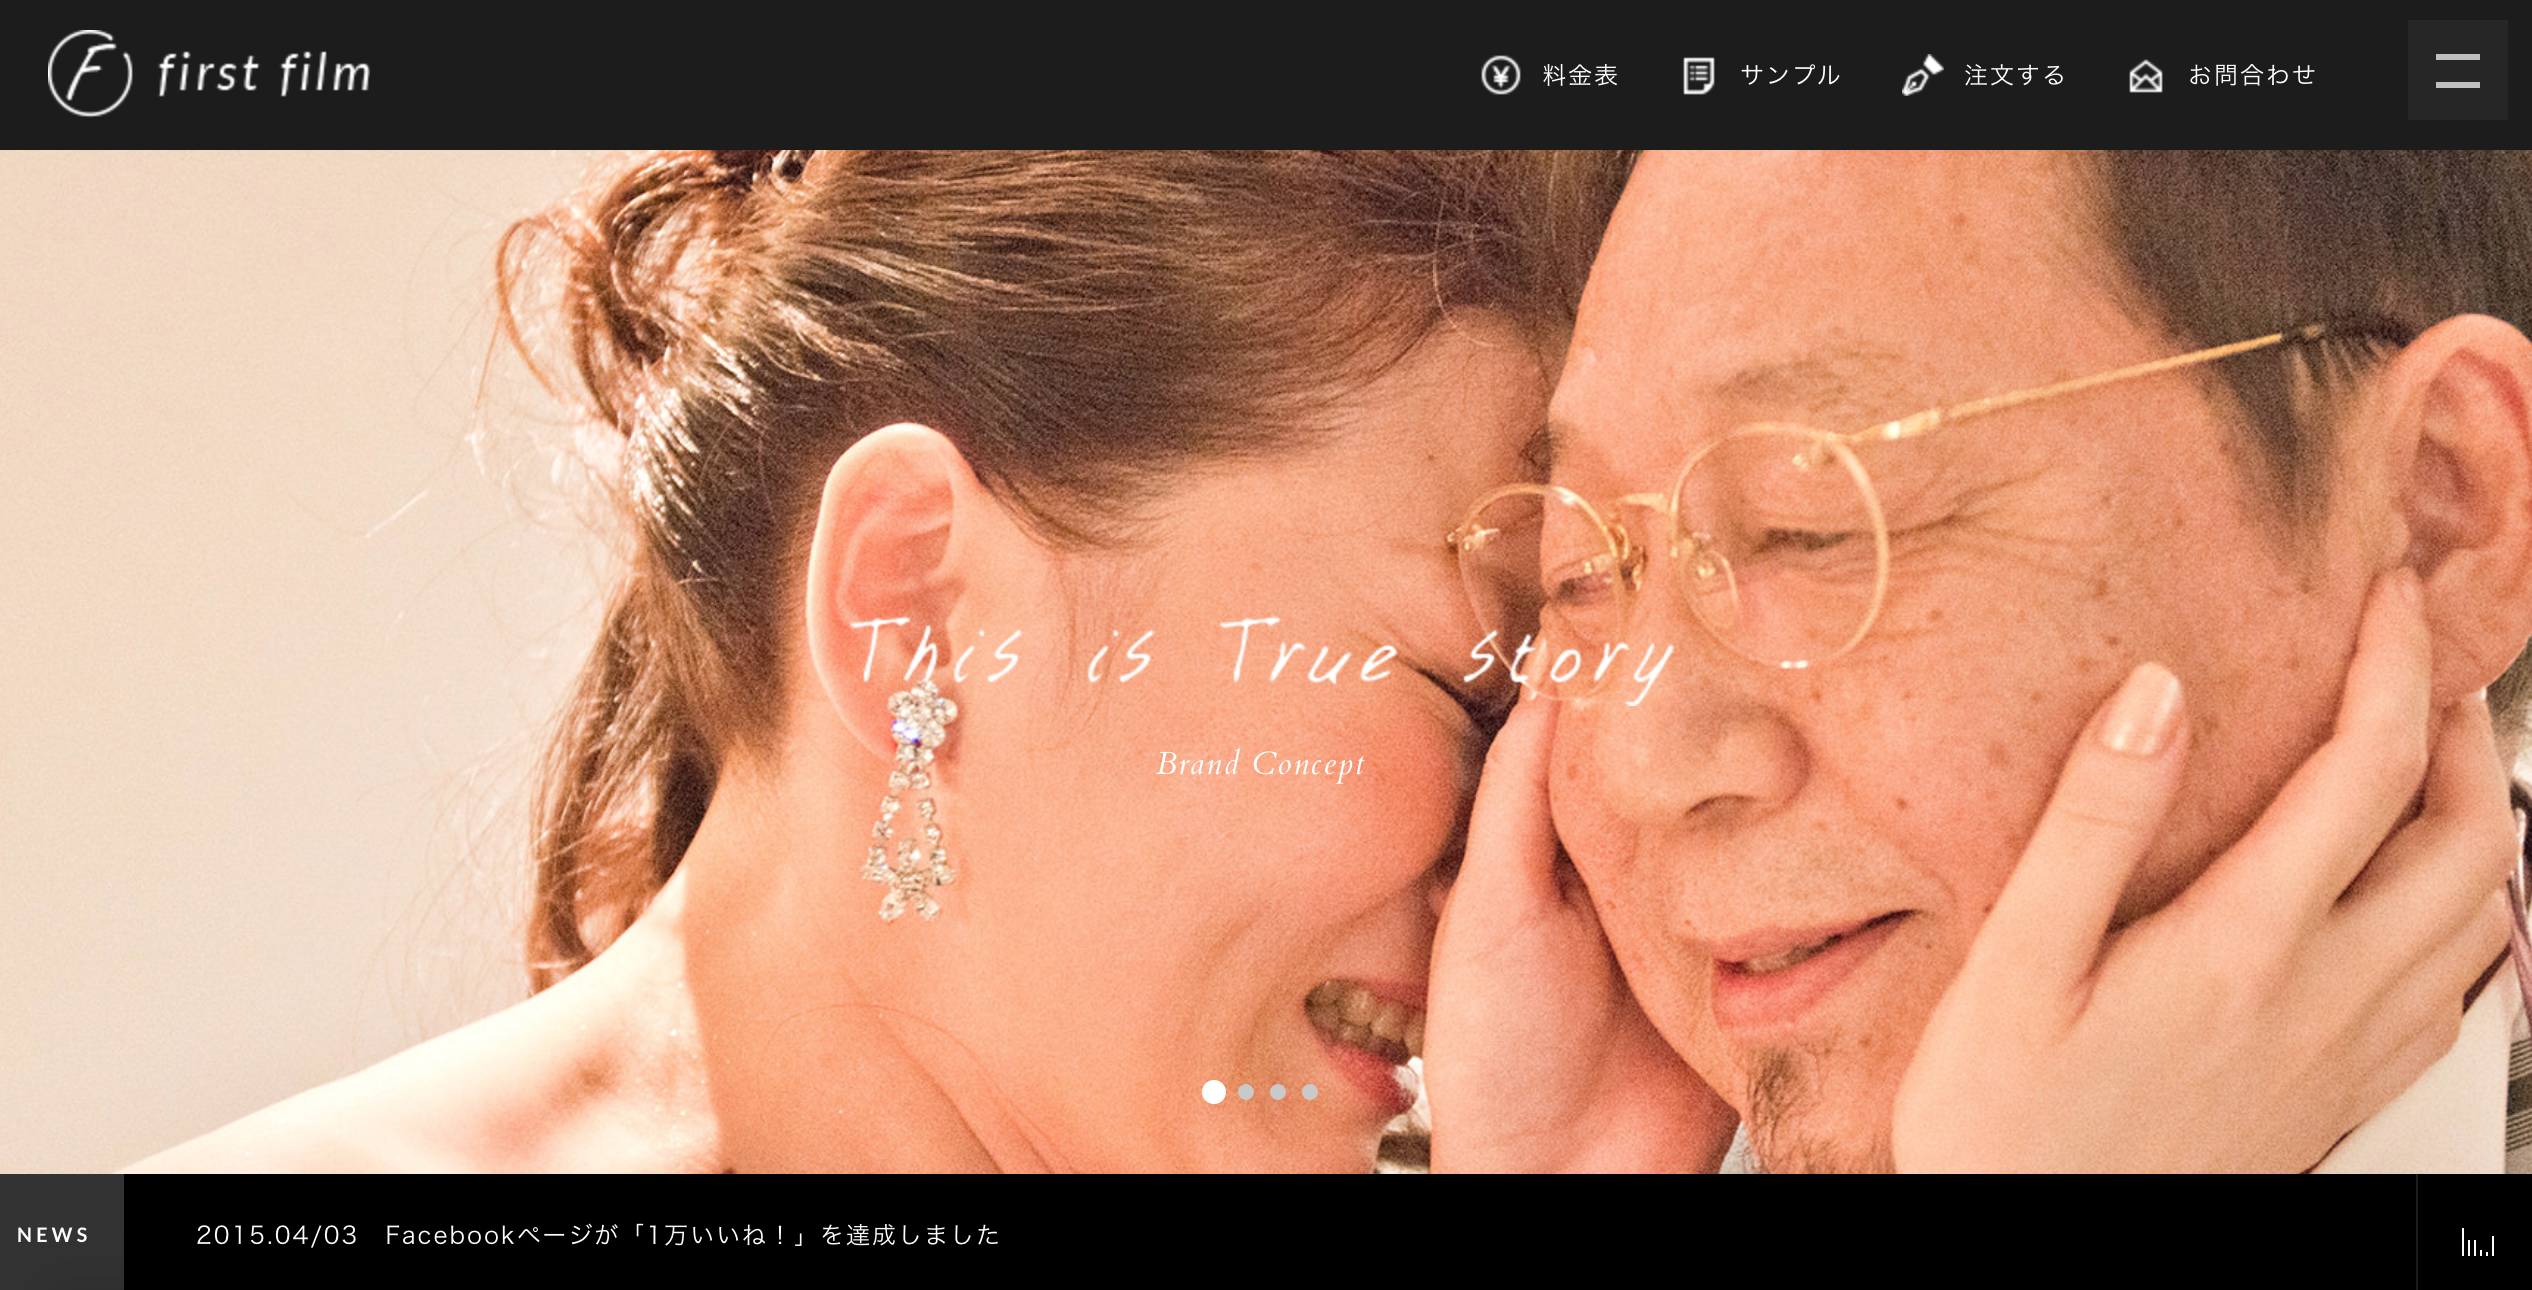 First Film(ファースト・フィルム)